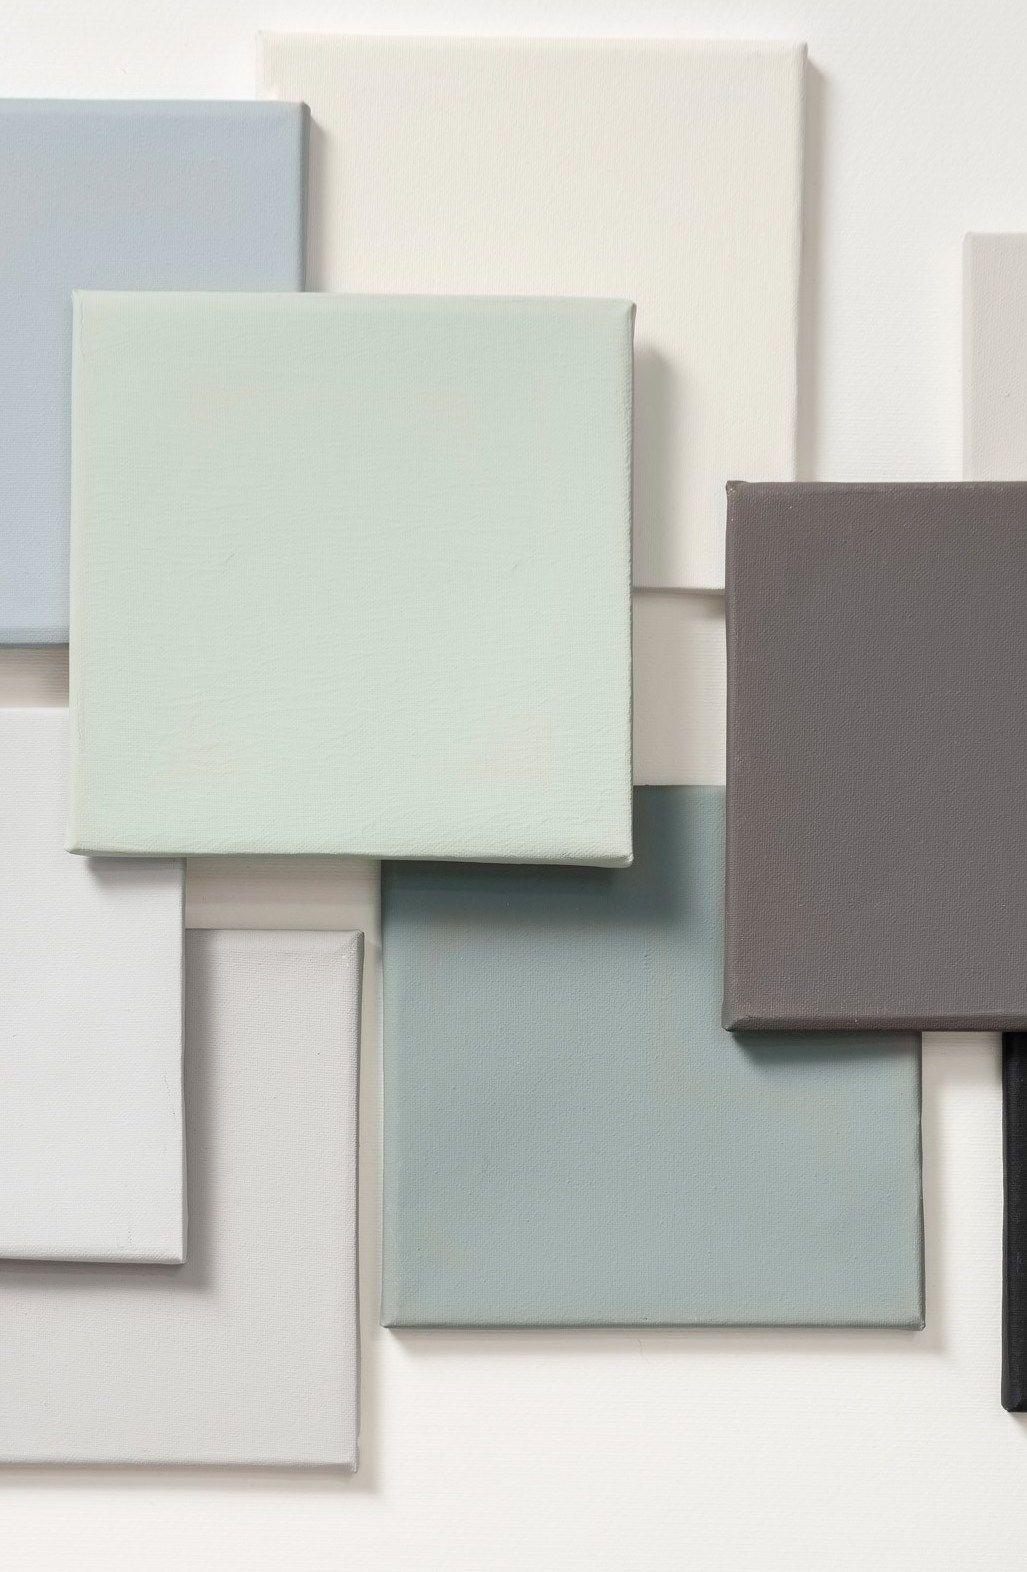 Dulux Colour For 2020 Tranquil Dawn With Images Dulux Colour